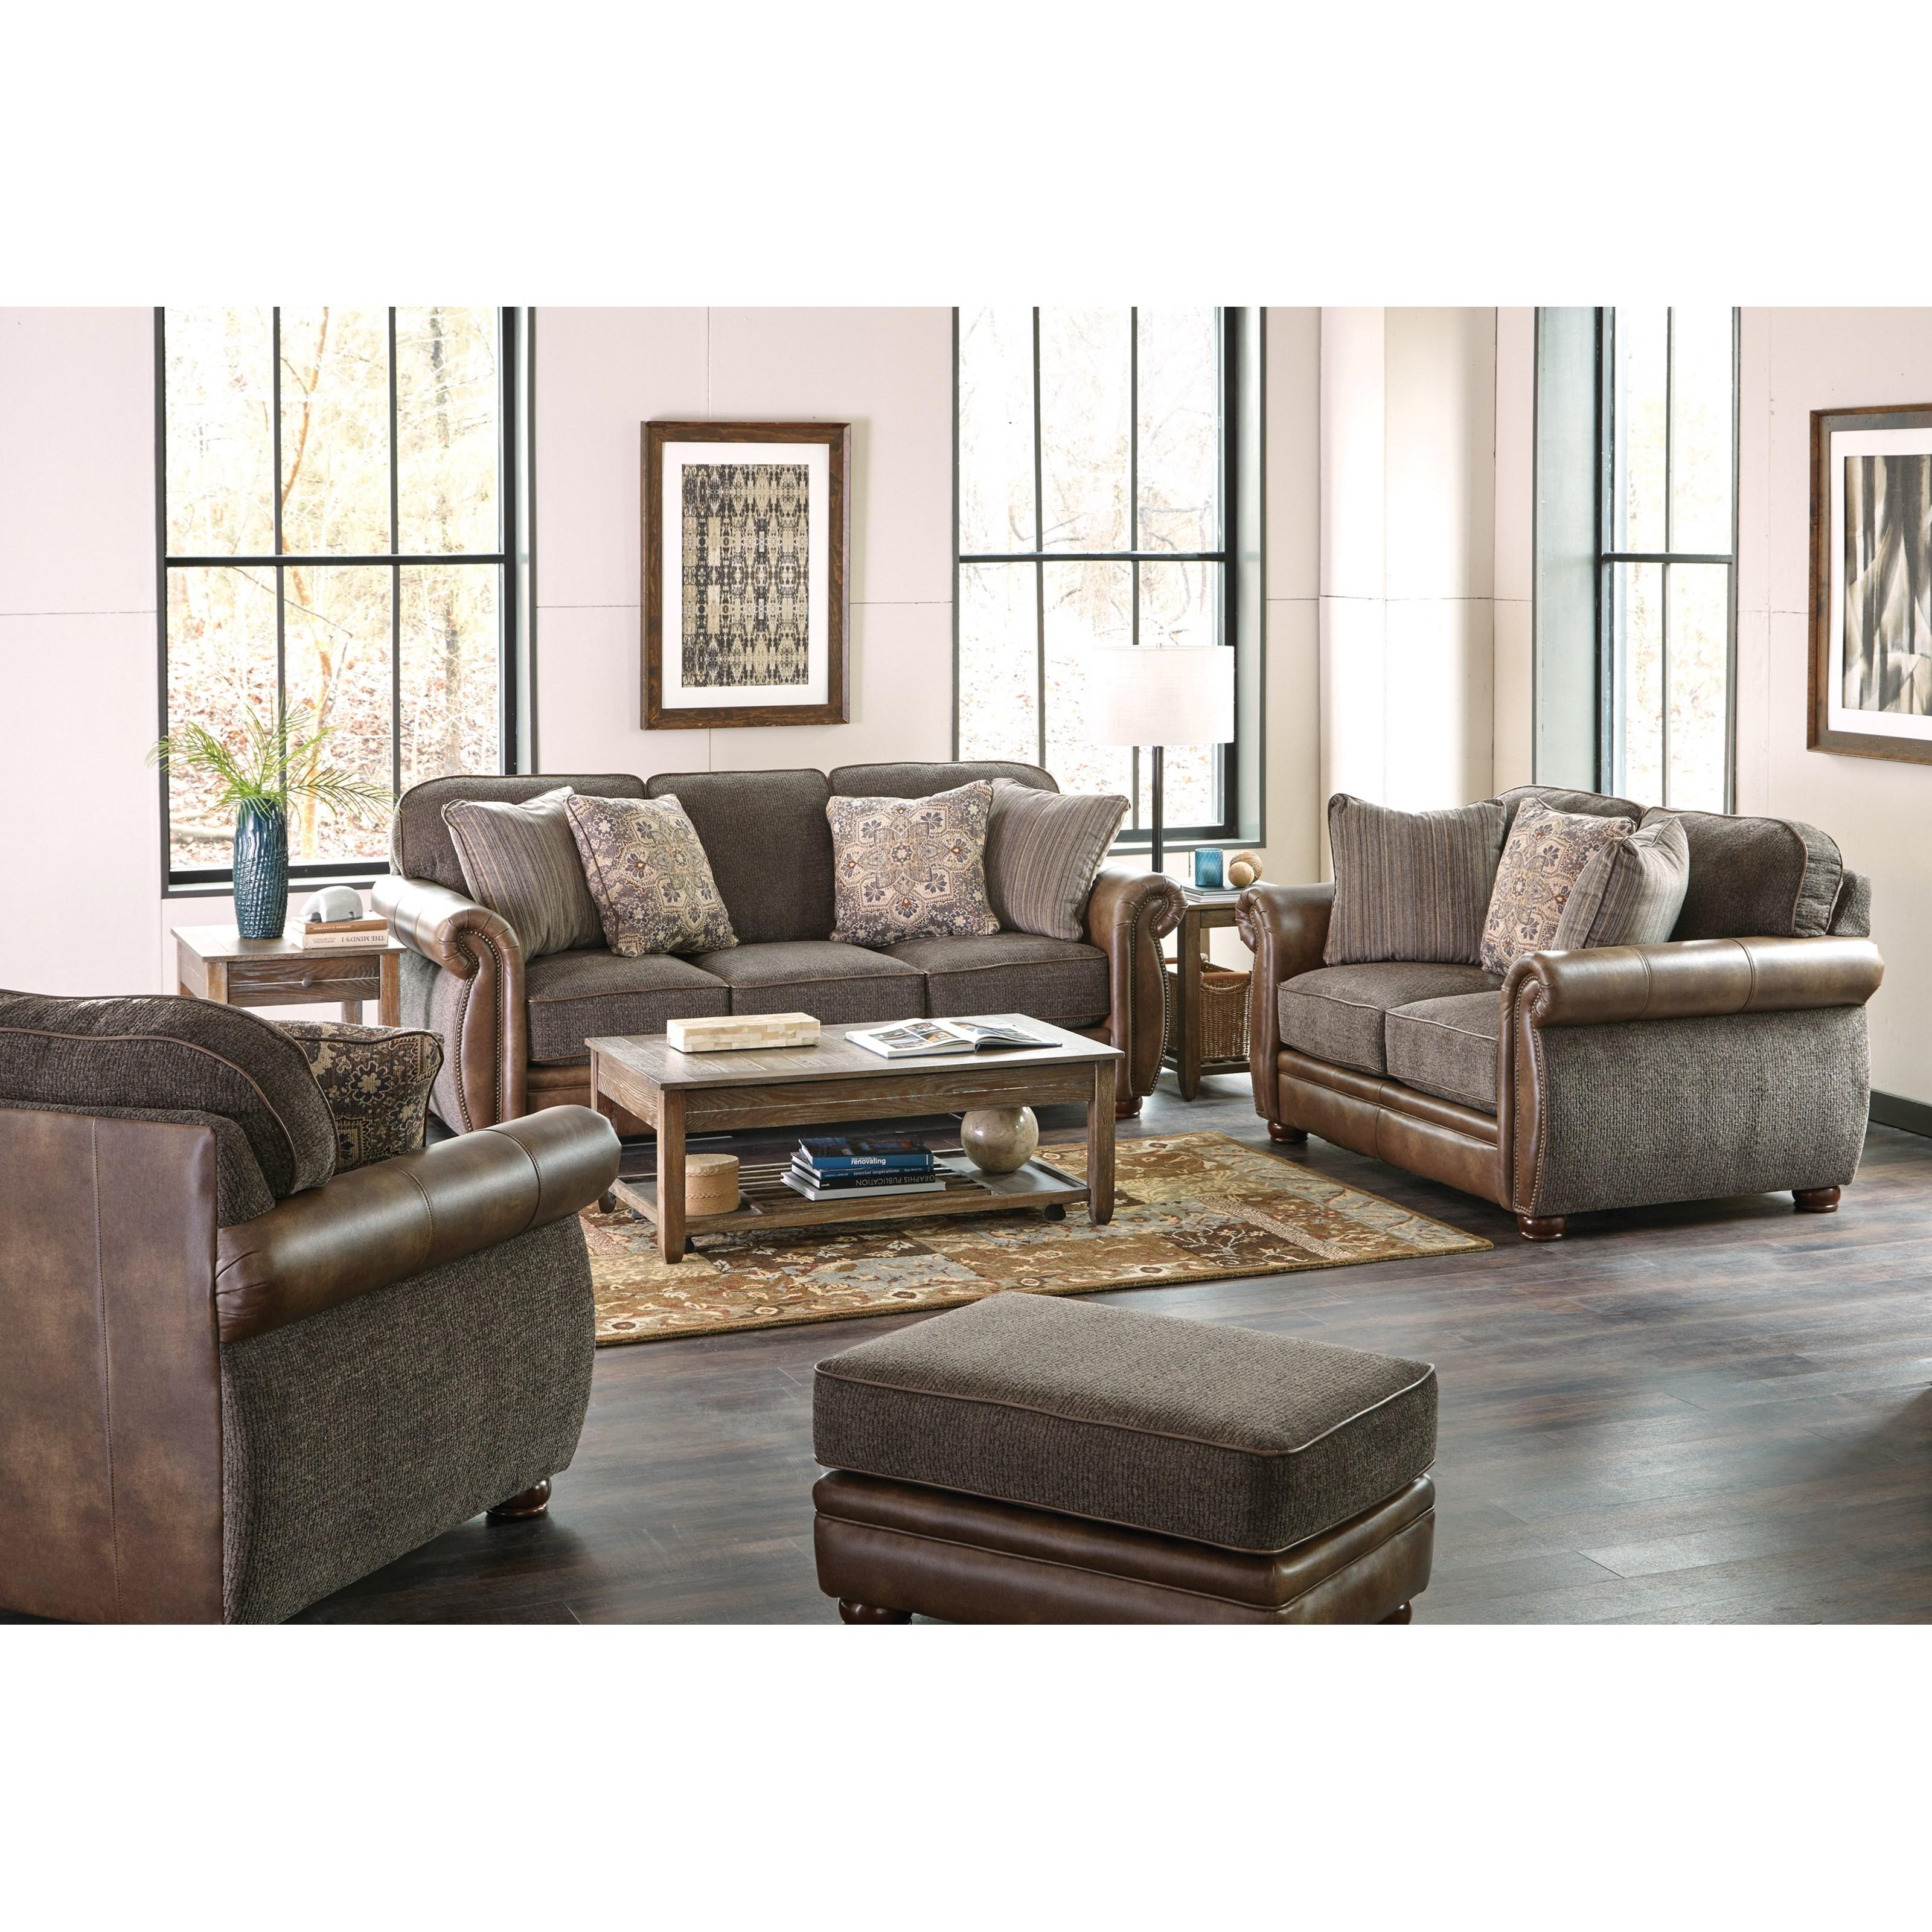 Jackson Furniture Pennington Traditional Styled Sofa